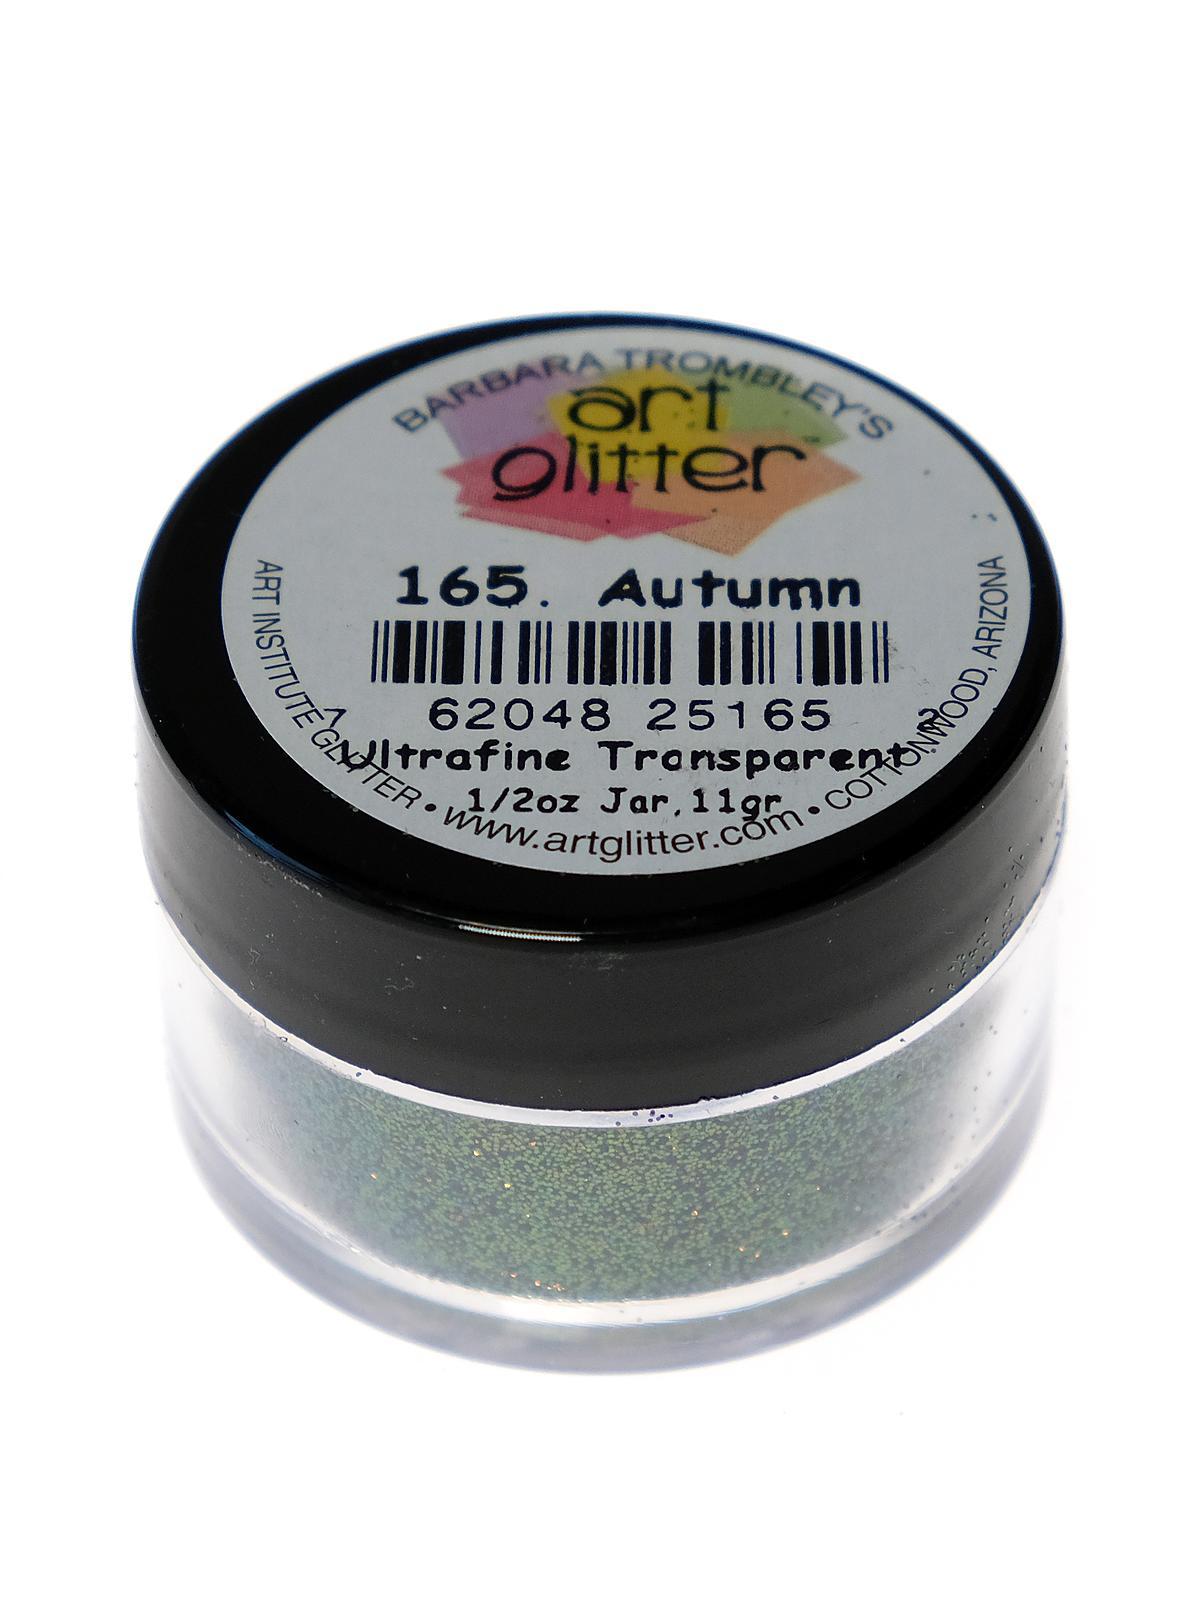 Ultrafine Transparent Glitter Autumn 1 2 Oz. Jar